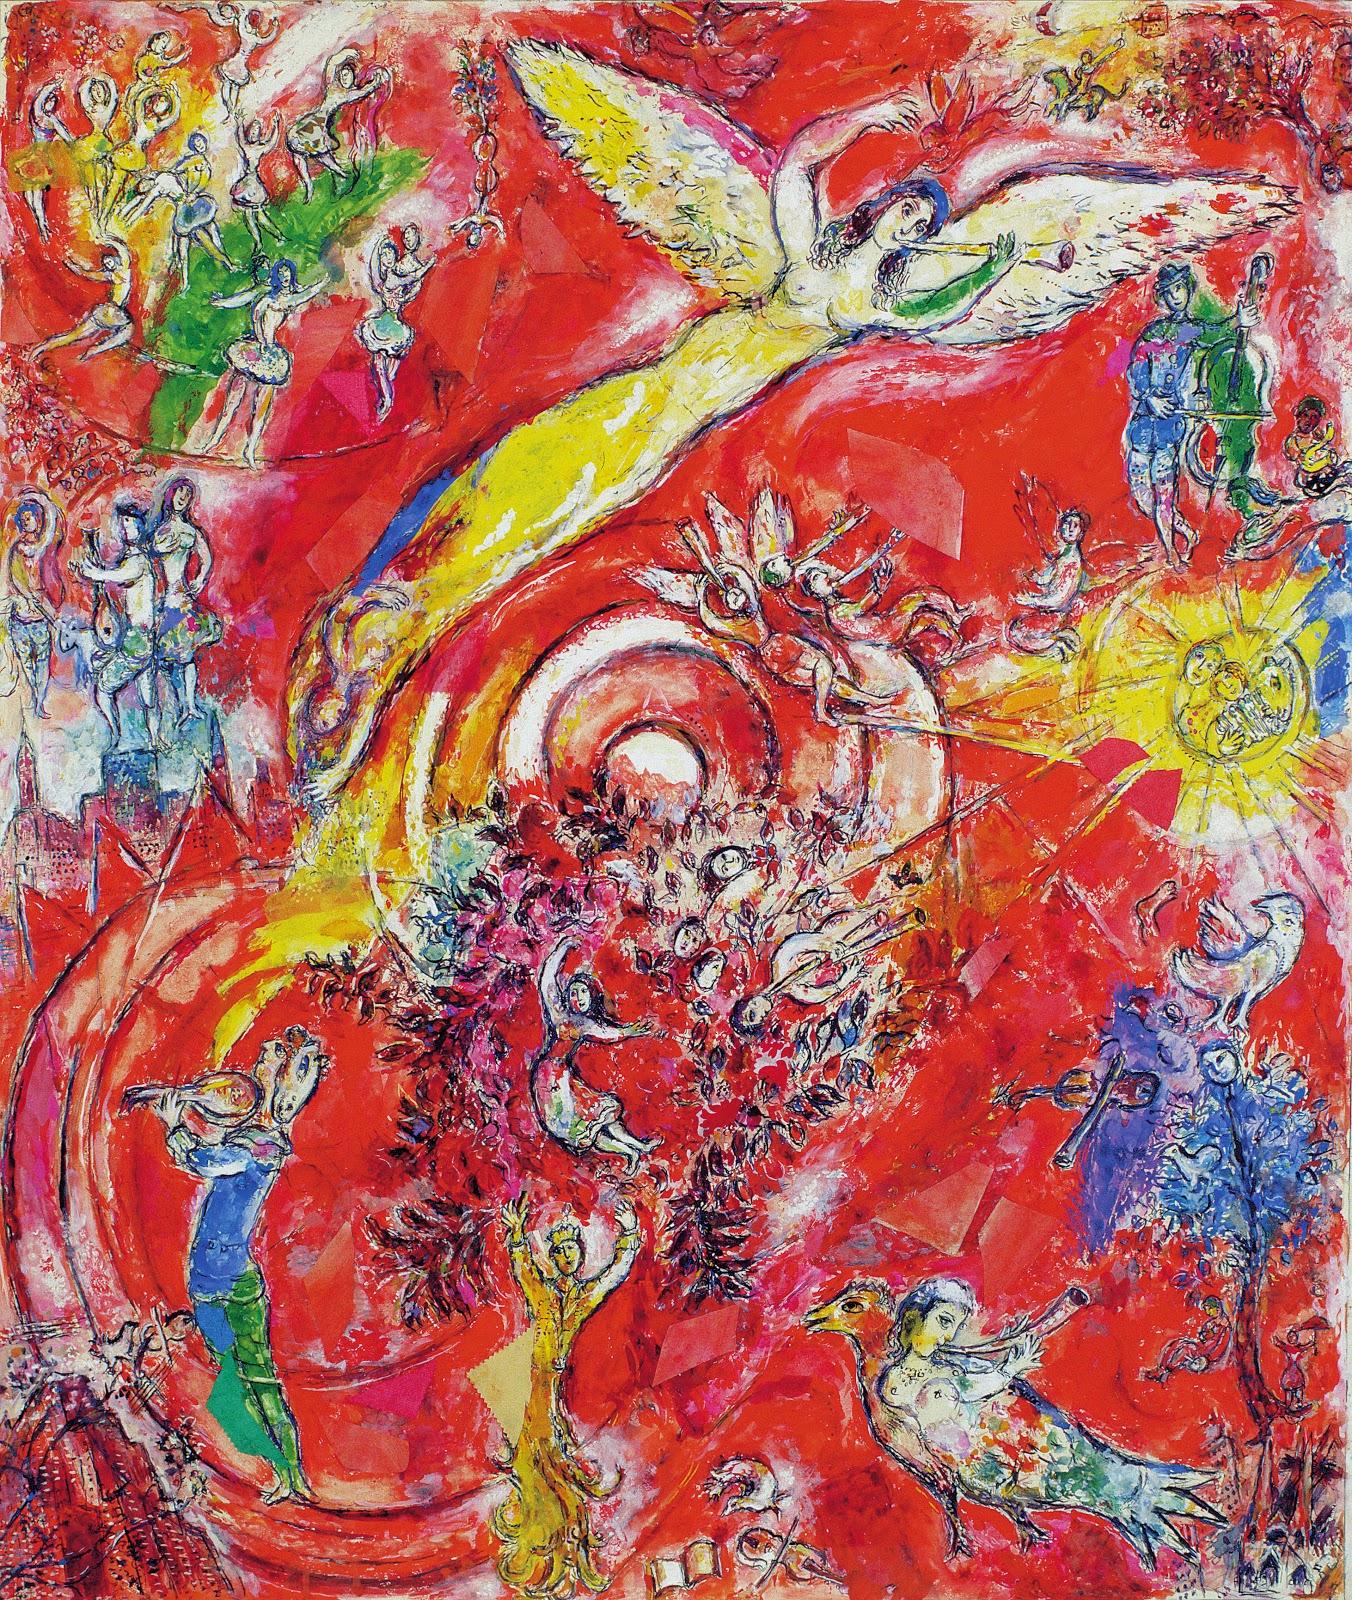 http://leboisdesarts.altervista.org/wp-content/uploads/2014/12/24_trionfo-della-musica.jpg